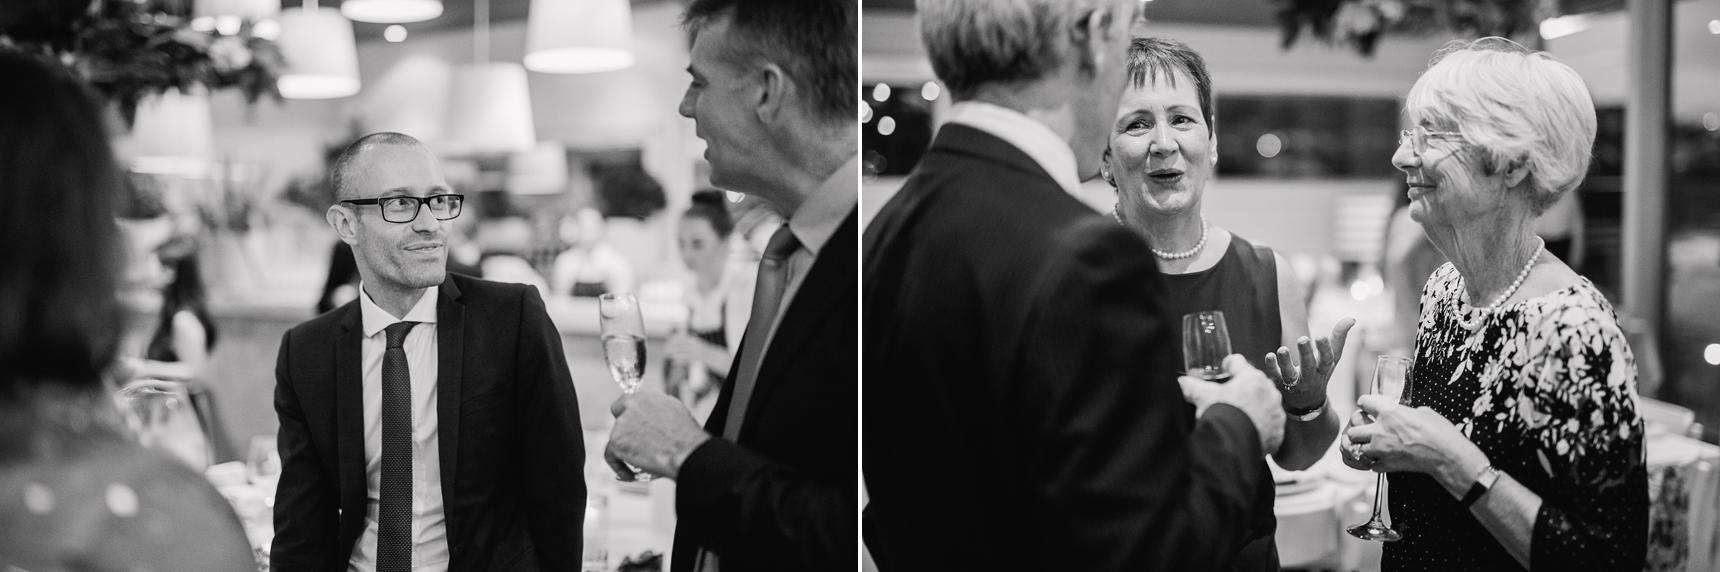 AngeRuss_MobyDicks_WhaleBeach_Wedding_Photography043.jpg